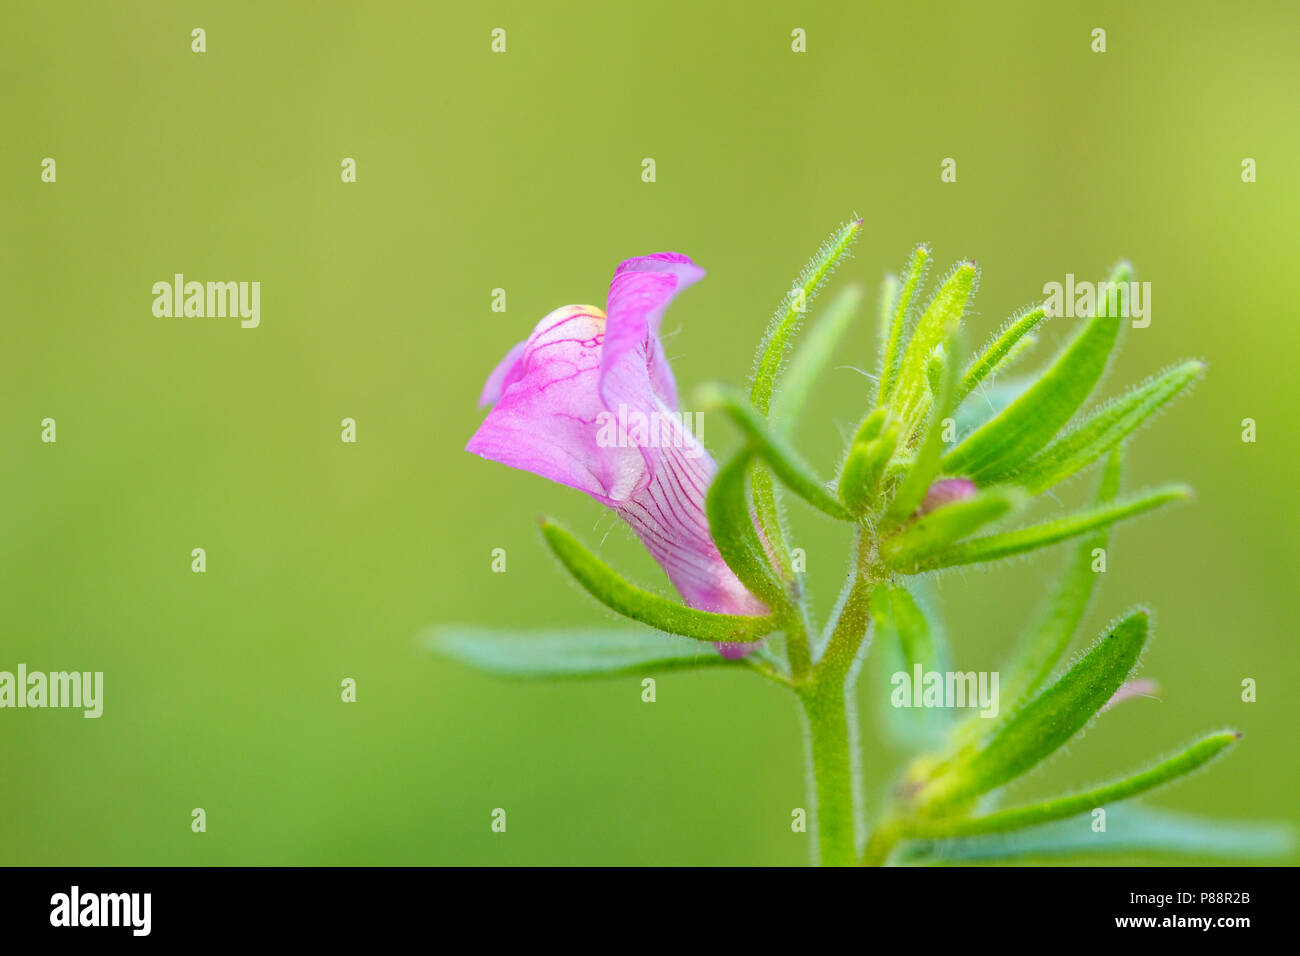 Akkerleeuwenbek, Lesser Snapdragon, Misopates orontium Stock Photo